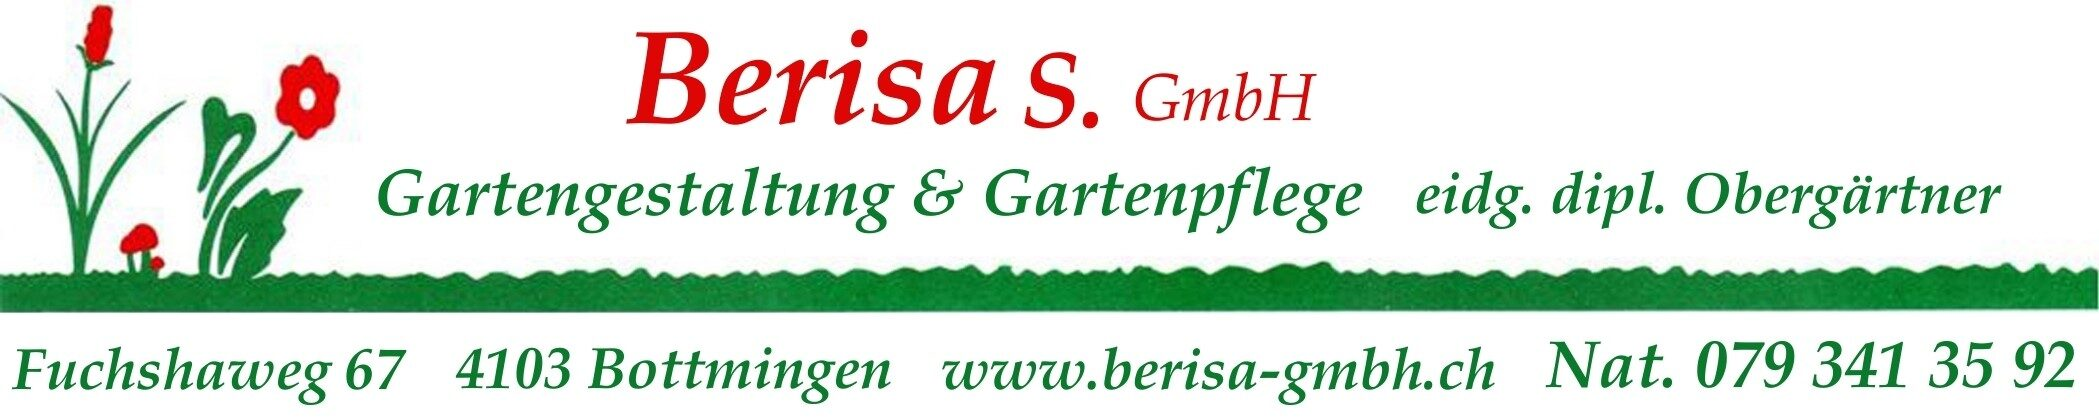 Berisa GmbH